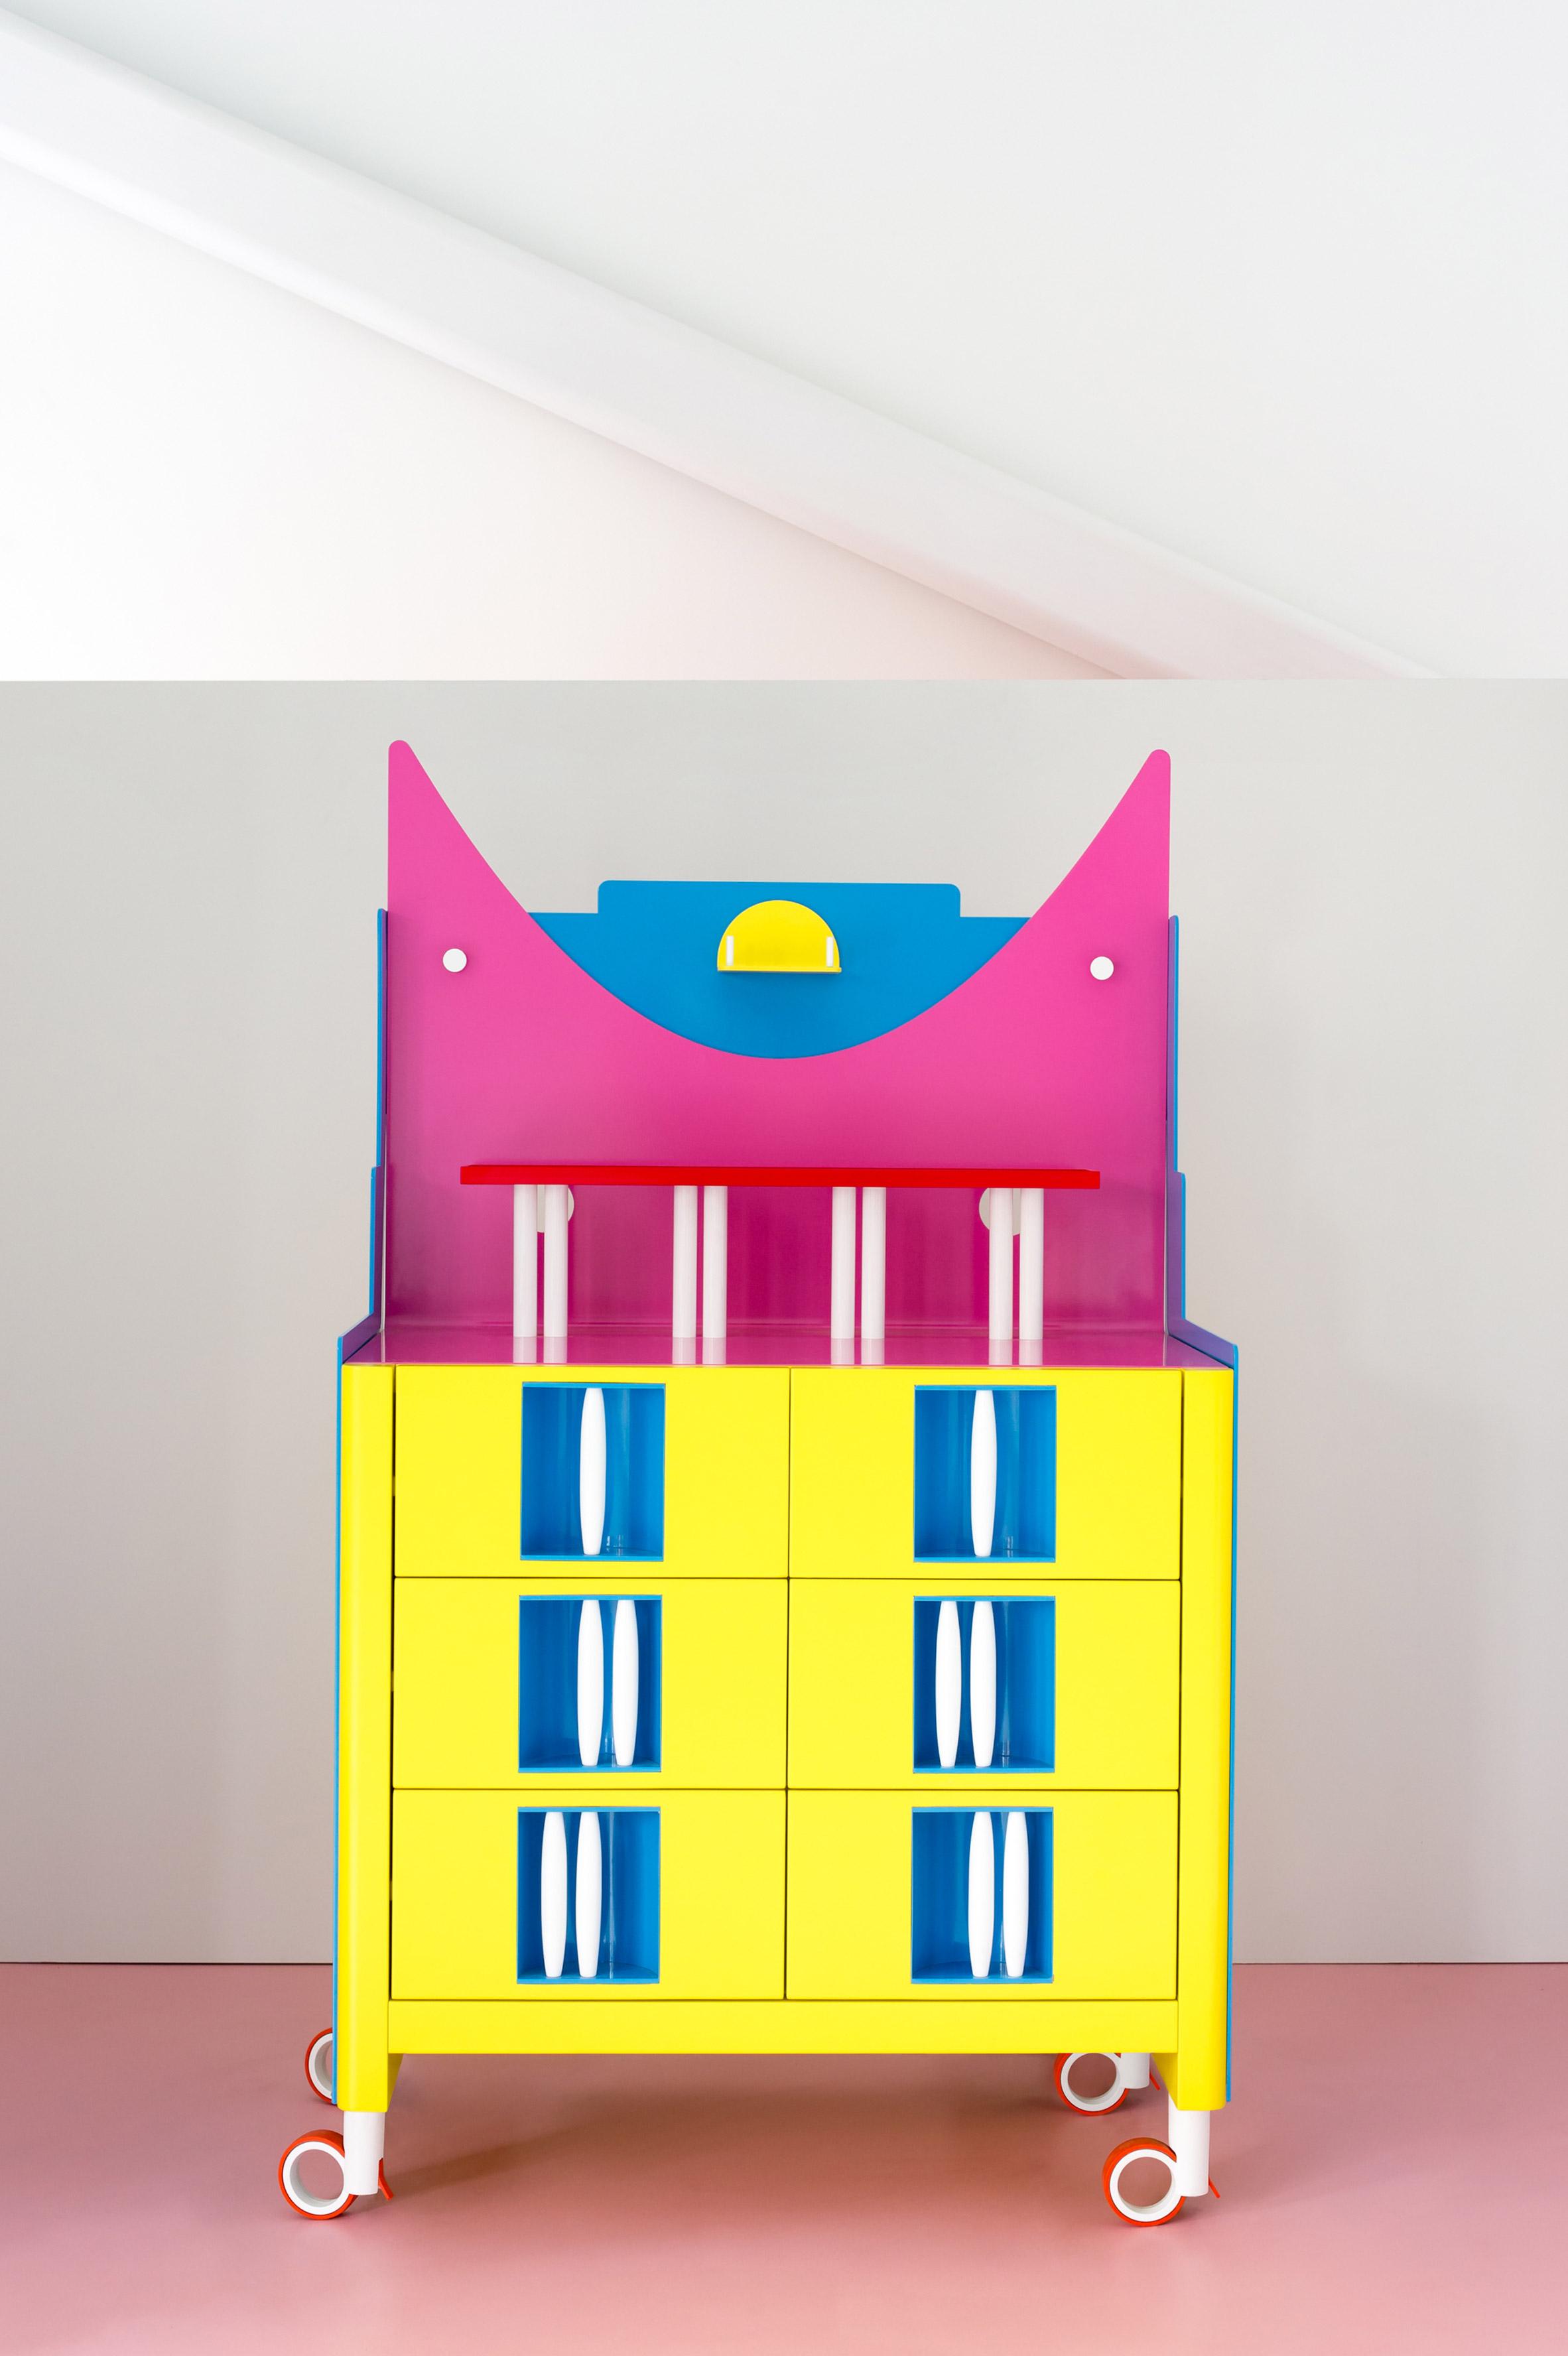 nakano-twins-adam-nathaniel-furman-furniture-design_dezeen_2364_col_1.jpg